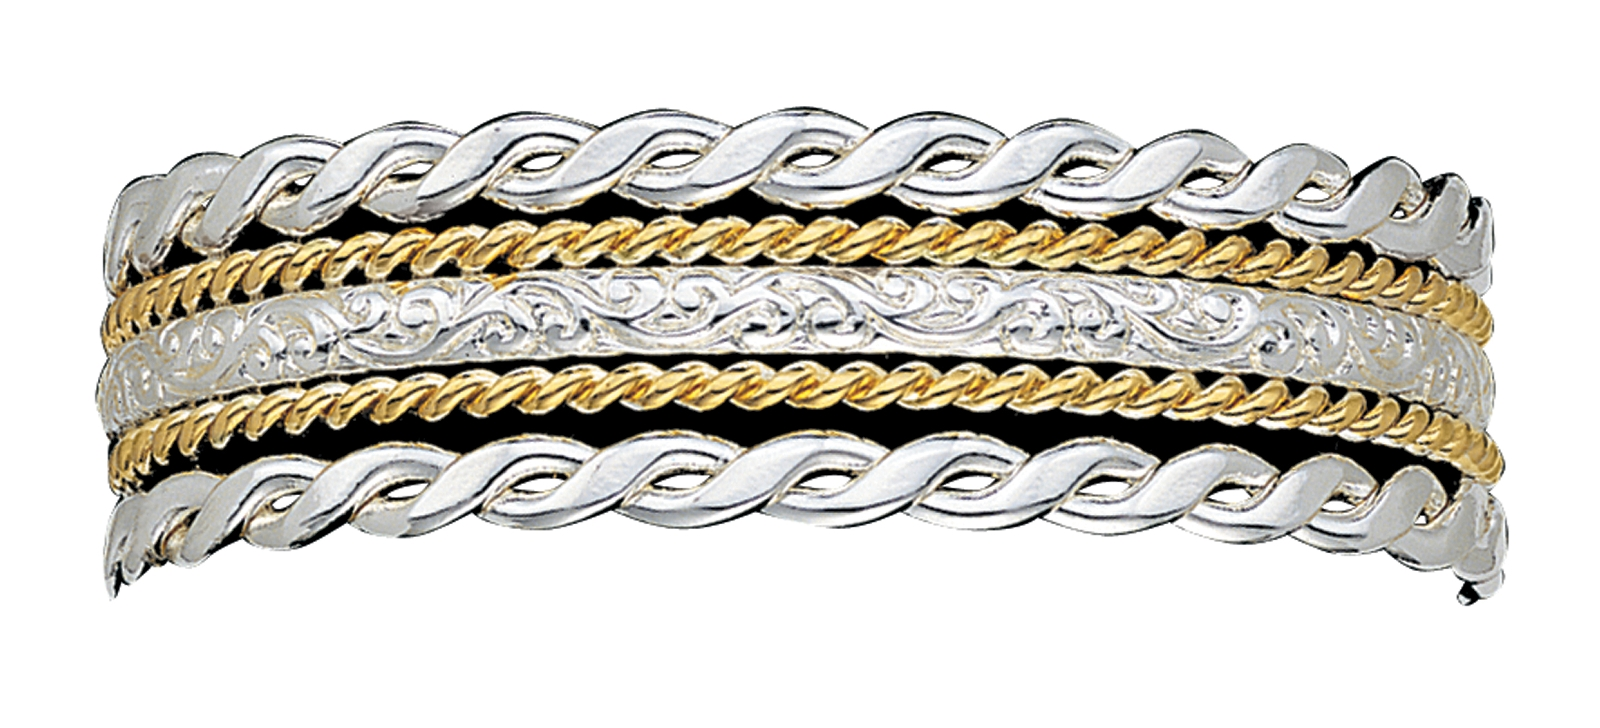 Montana Silversmiths Twisted Rope 5 Strand Bracelet